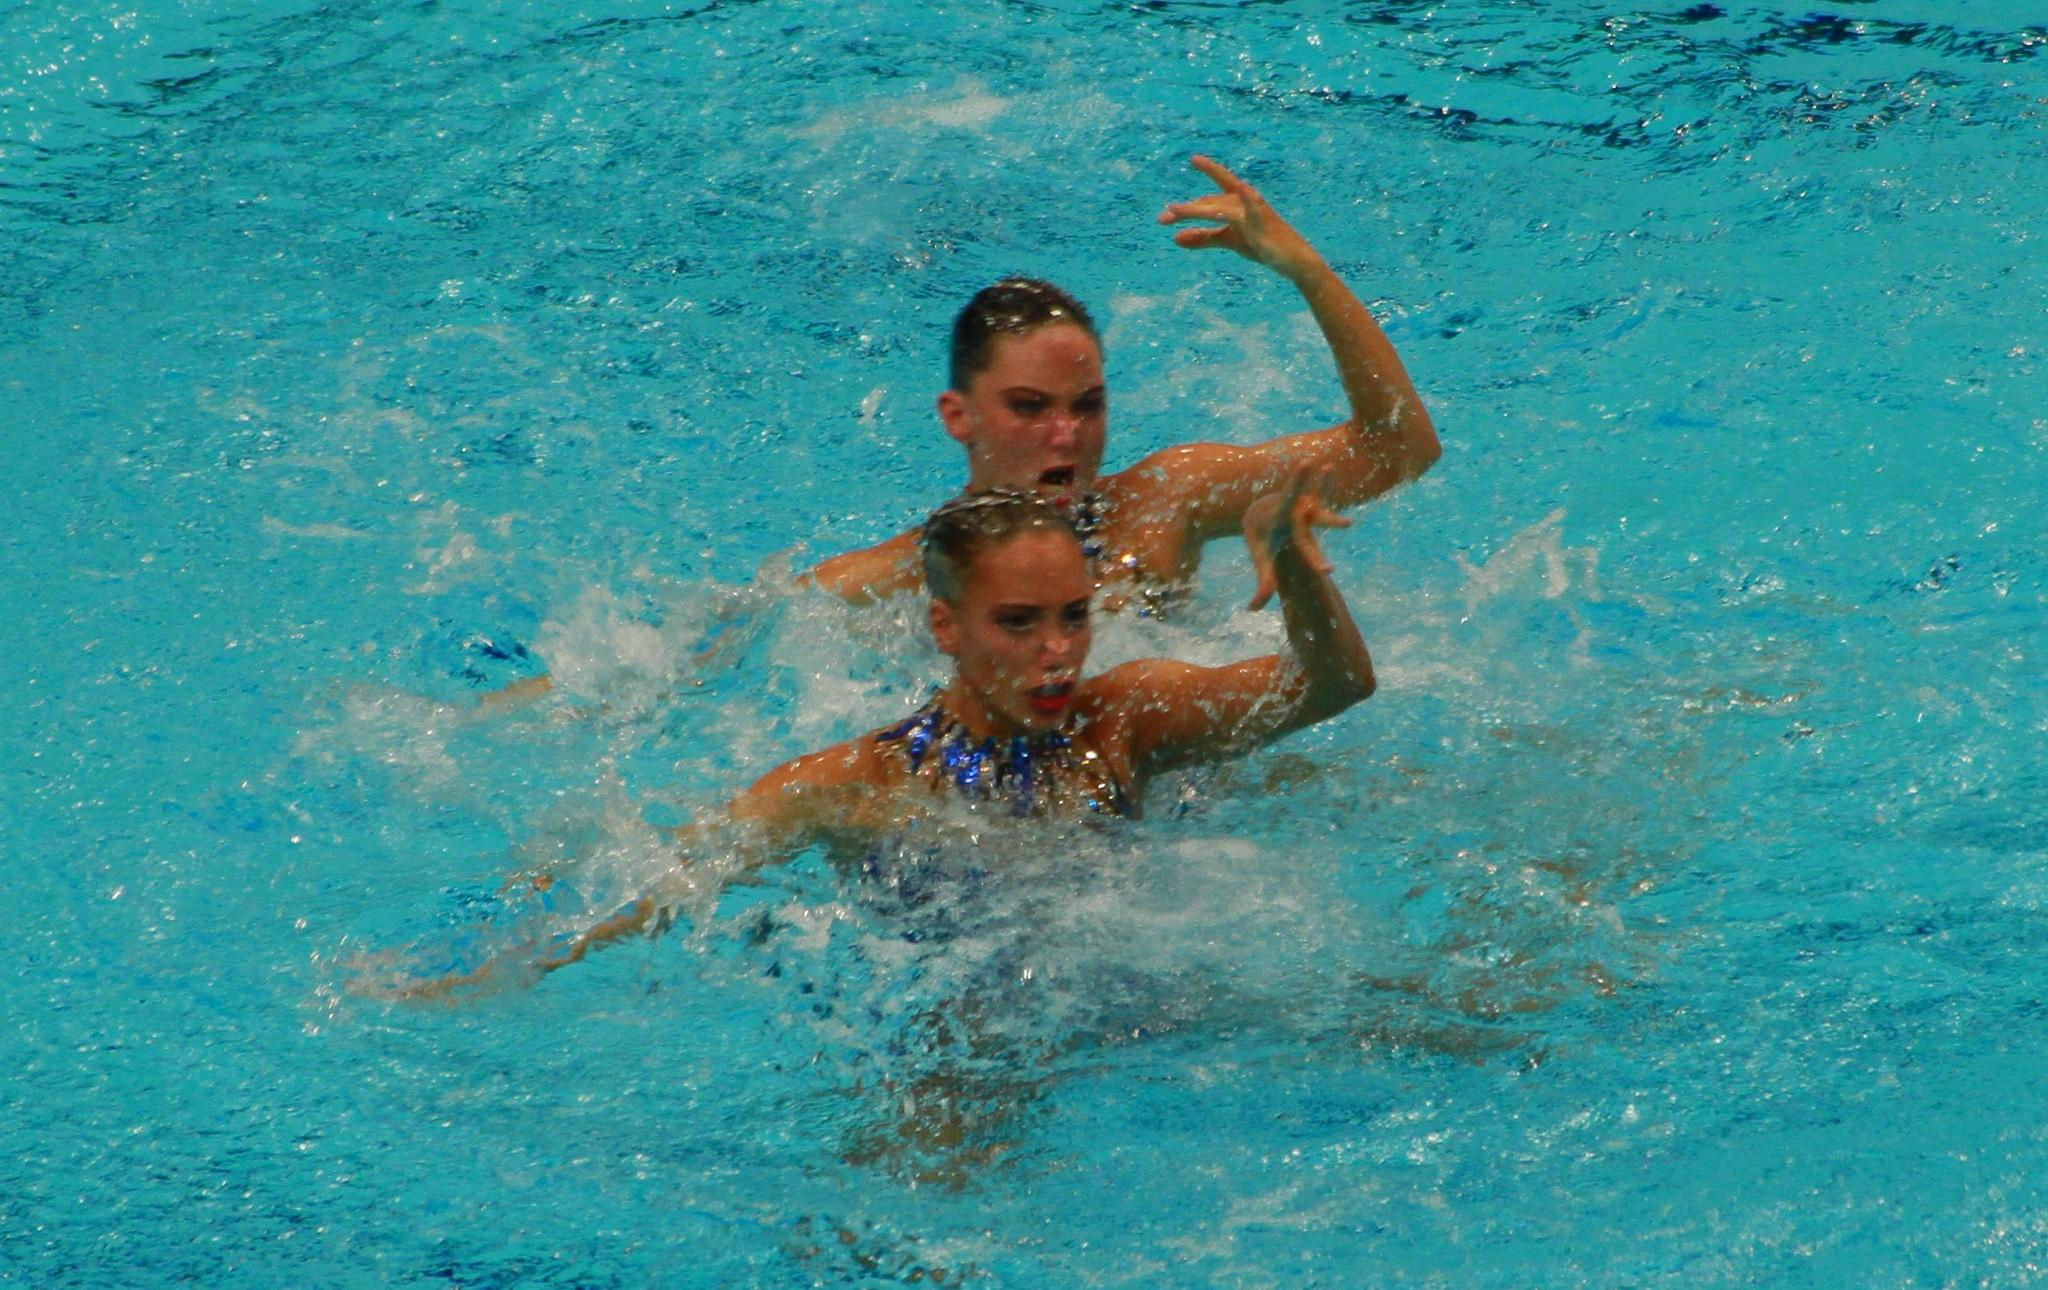 547023216_GreatBritainSynchronisedSwimming27_122_7lo.jpg